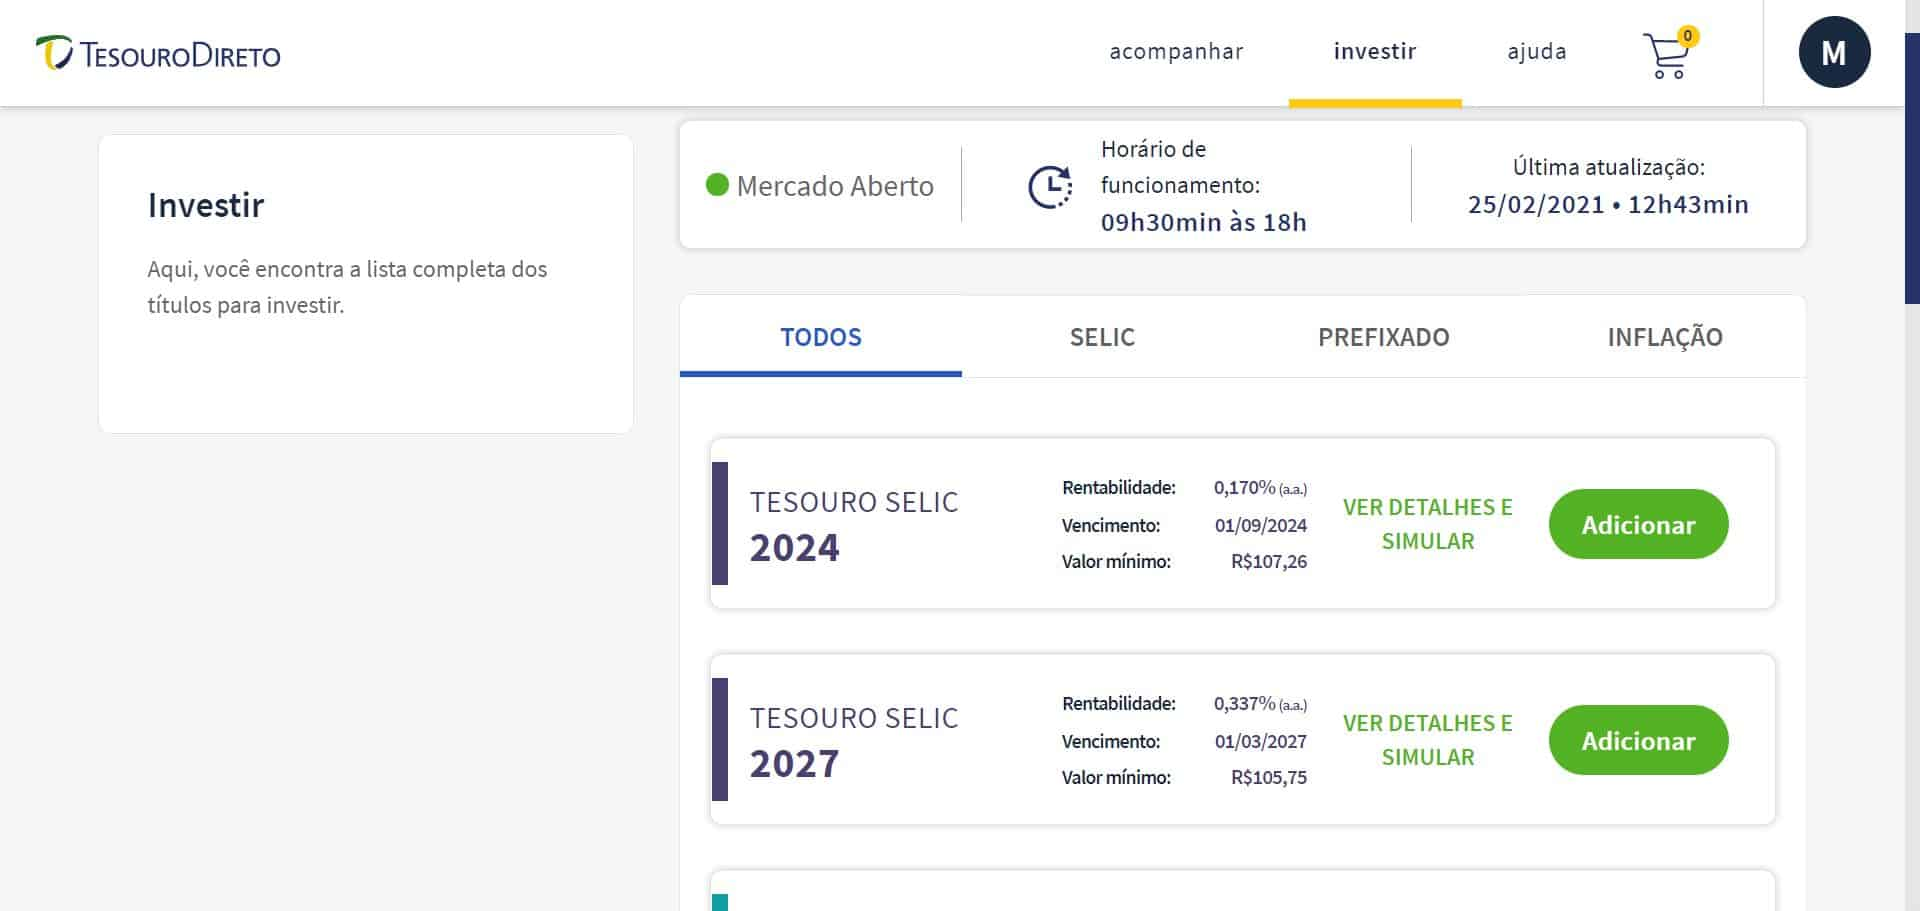 captura de tela dos títulos no portal do investidor